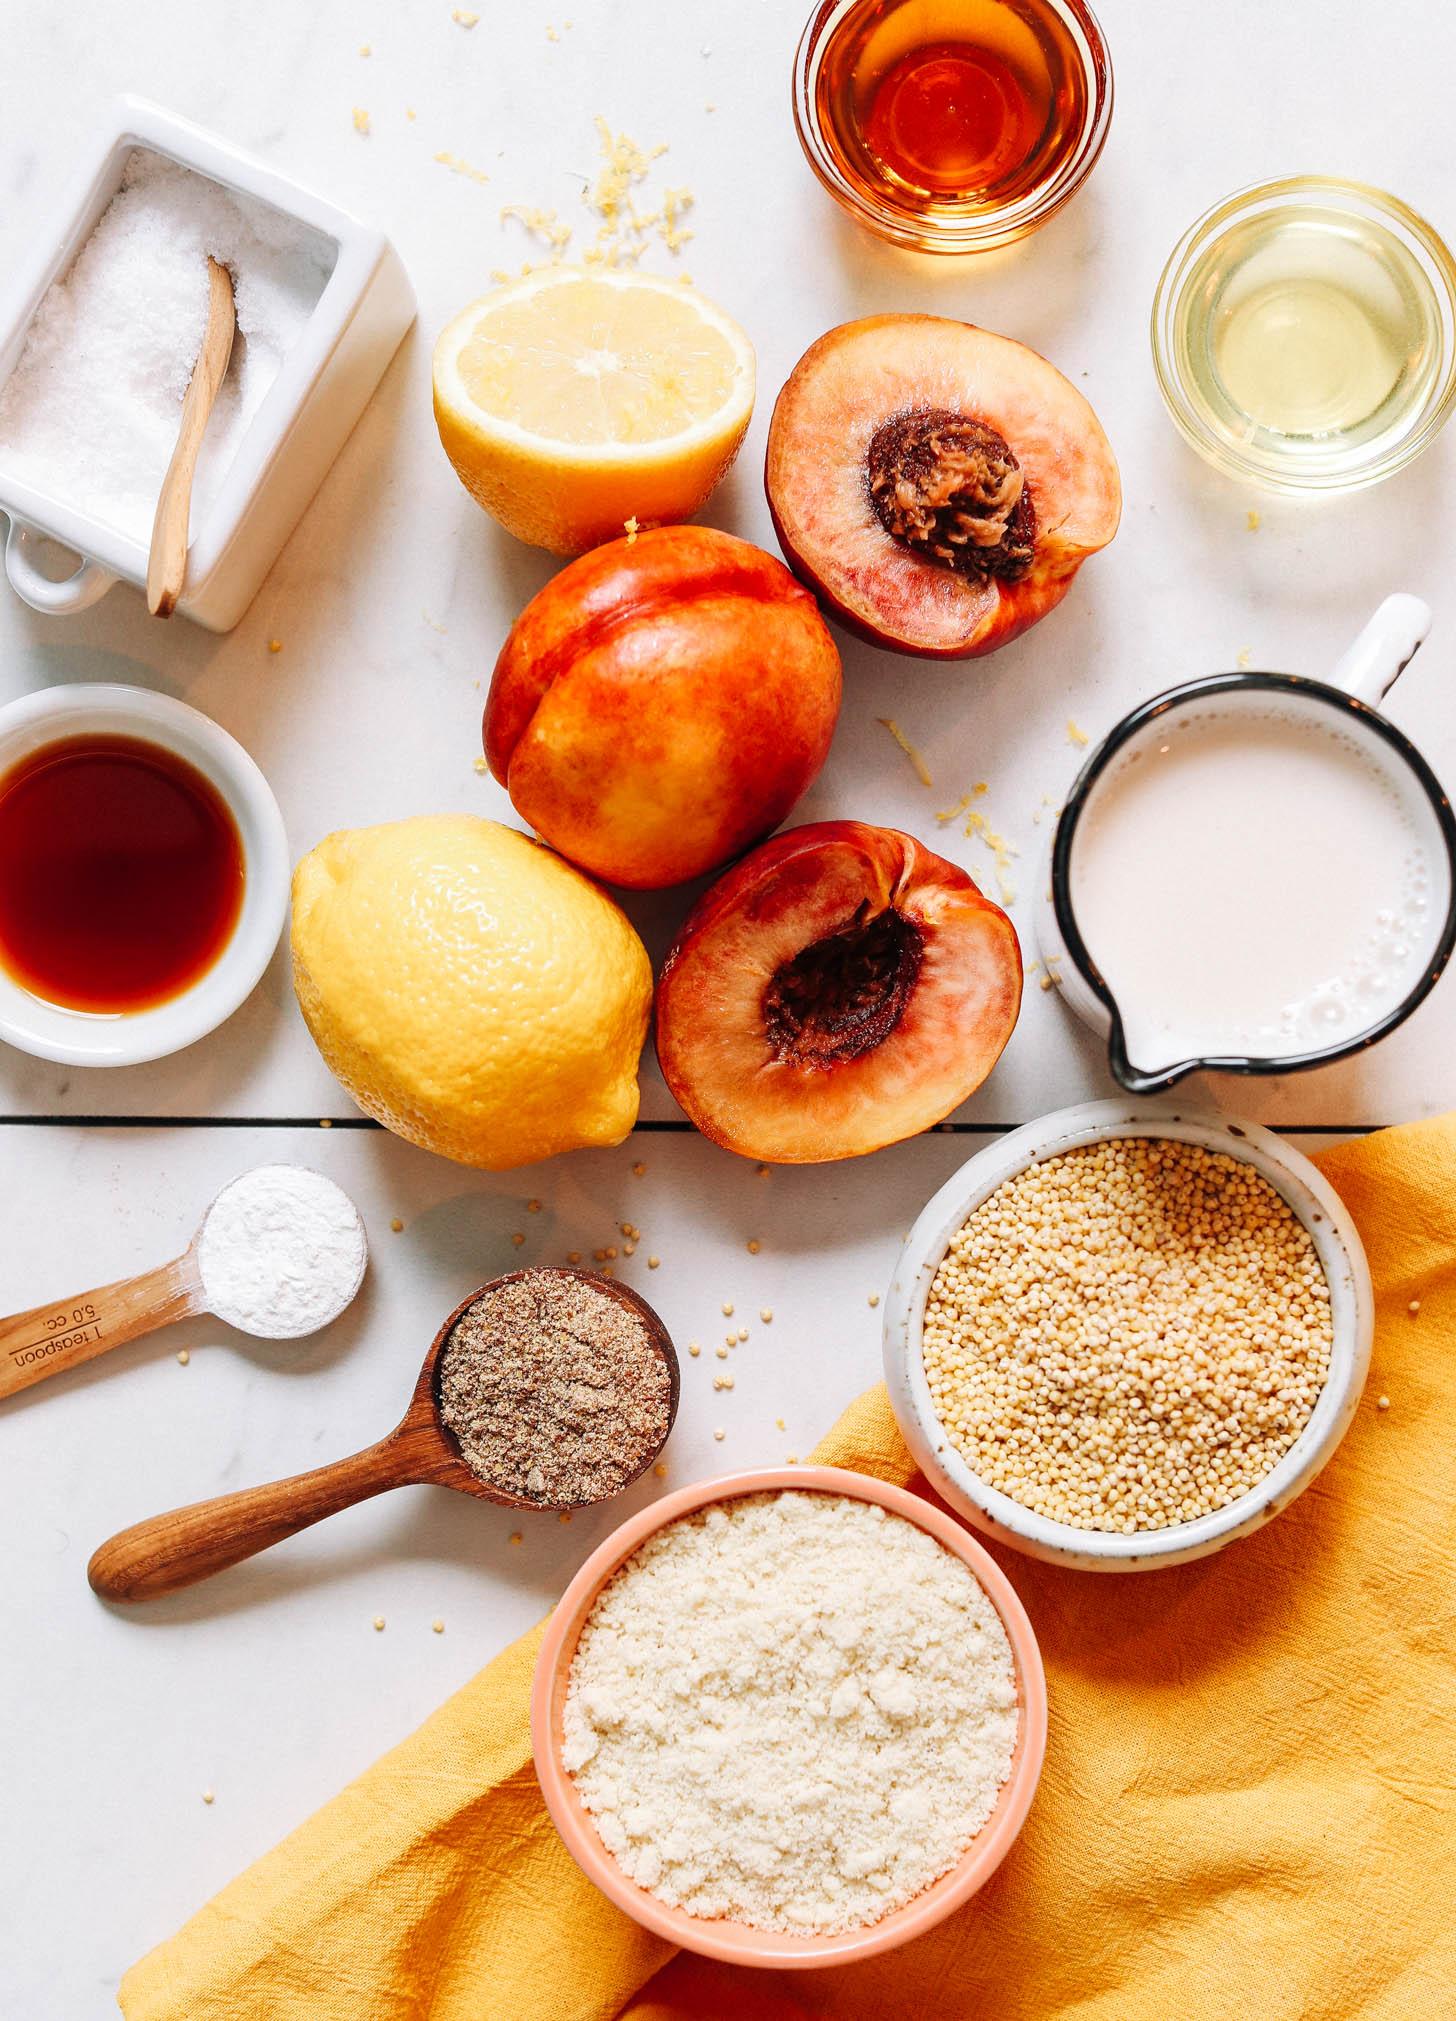 Salt, nectarines, lemon, maple syrup, vanilla, flaxseed, baking powder, almond flour, millet, almond milk, and avocado oil